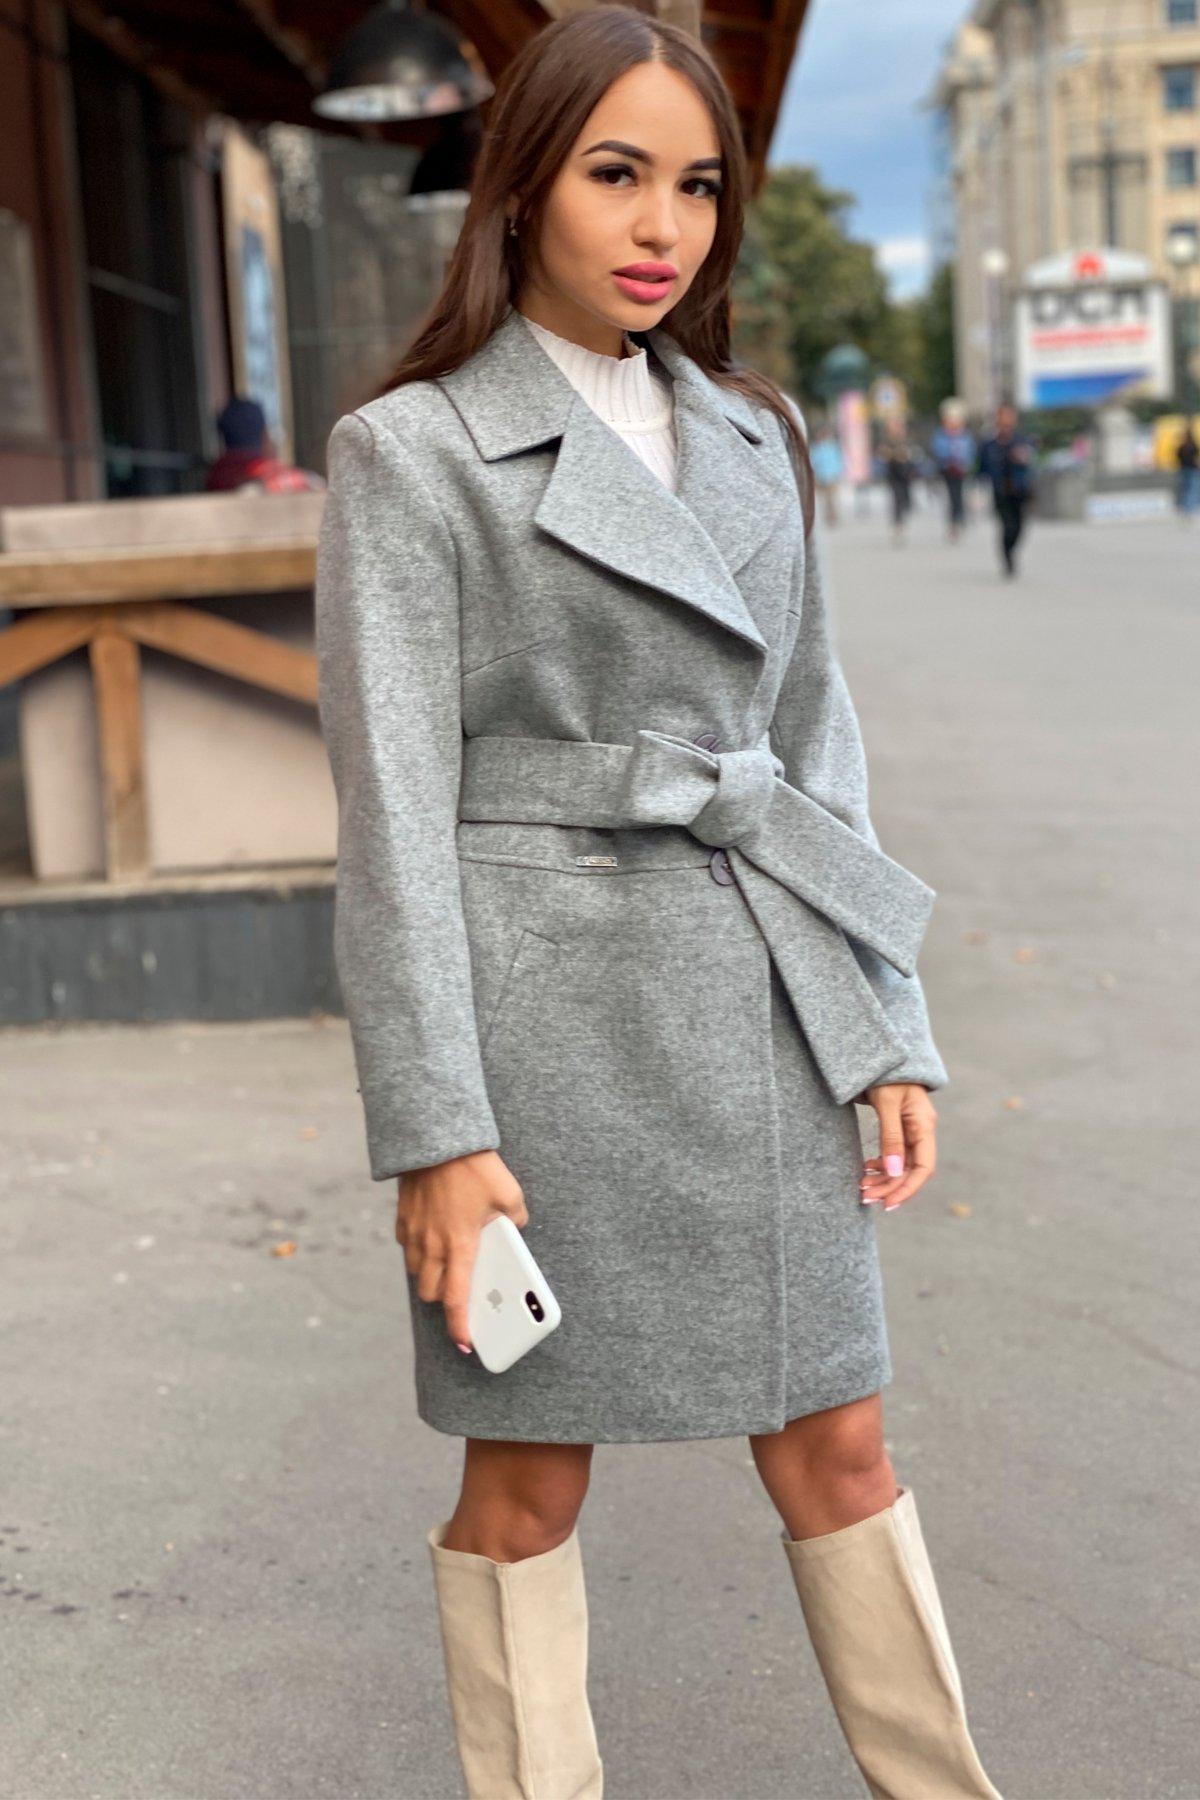 Пальто Габриэлла 7823 АРТ. 43703 Цвет: Серый 1 - фото 8, интернет магазин tm-modus.ru